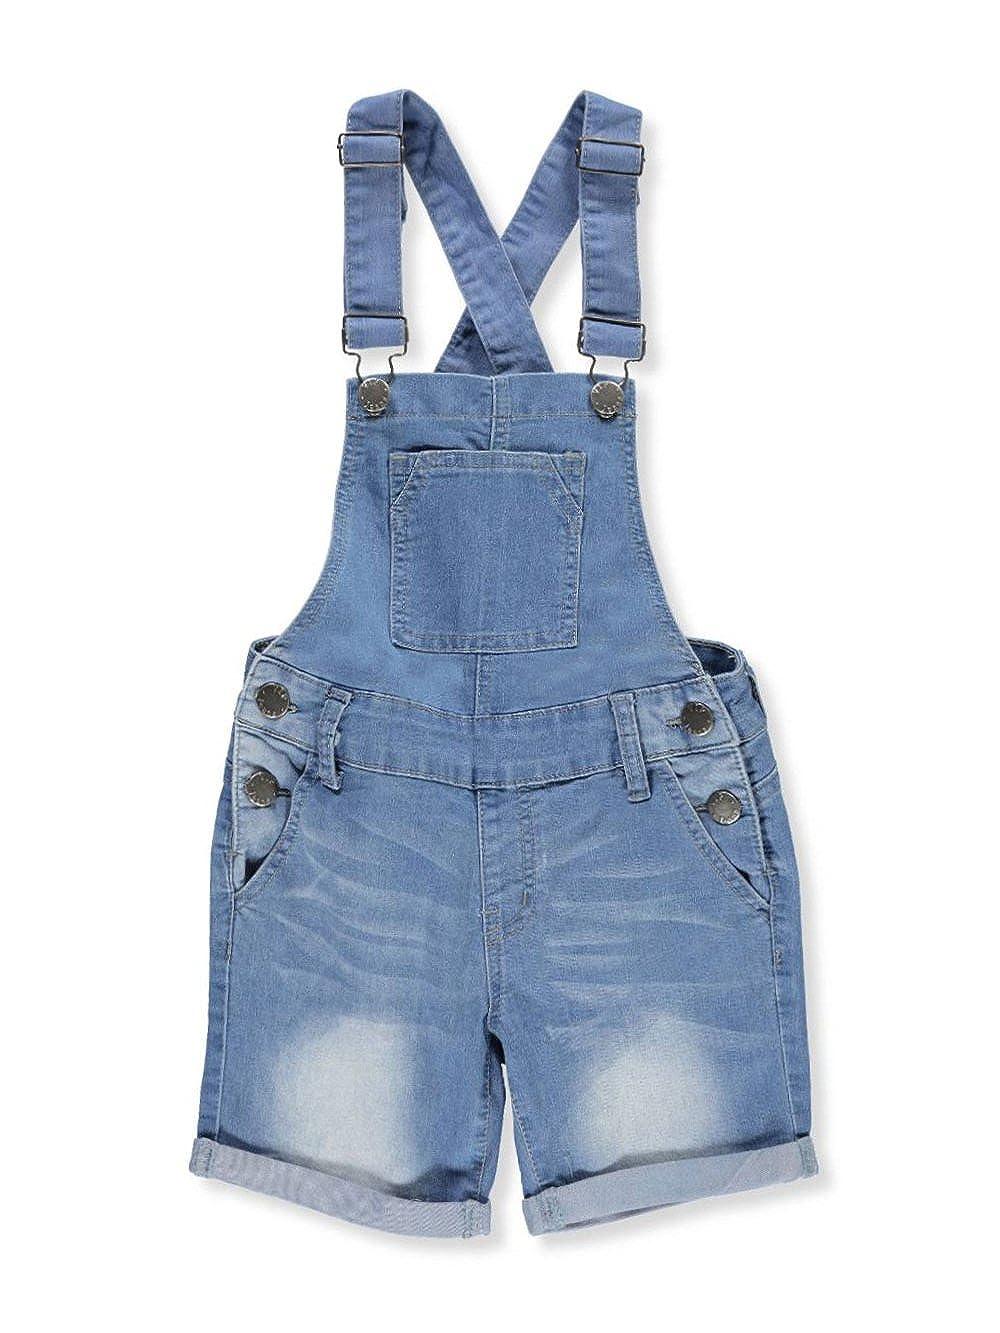 #VIP Jeans Girls' Overalls 12